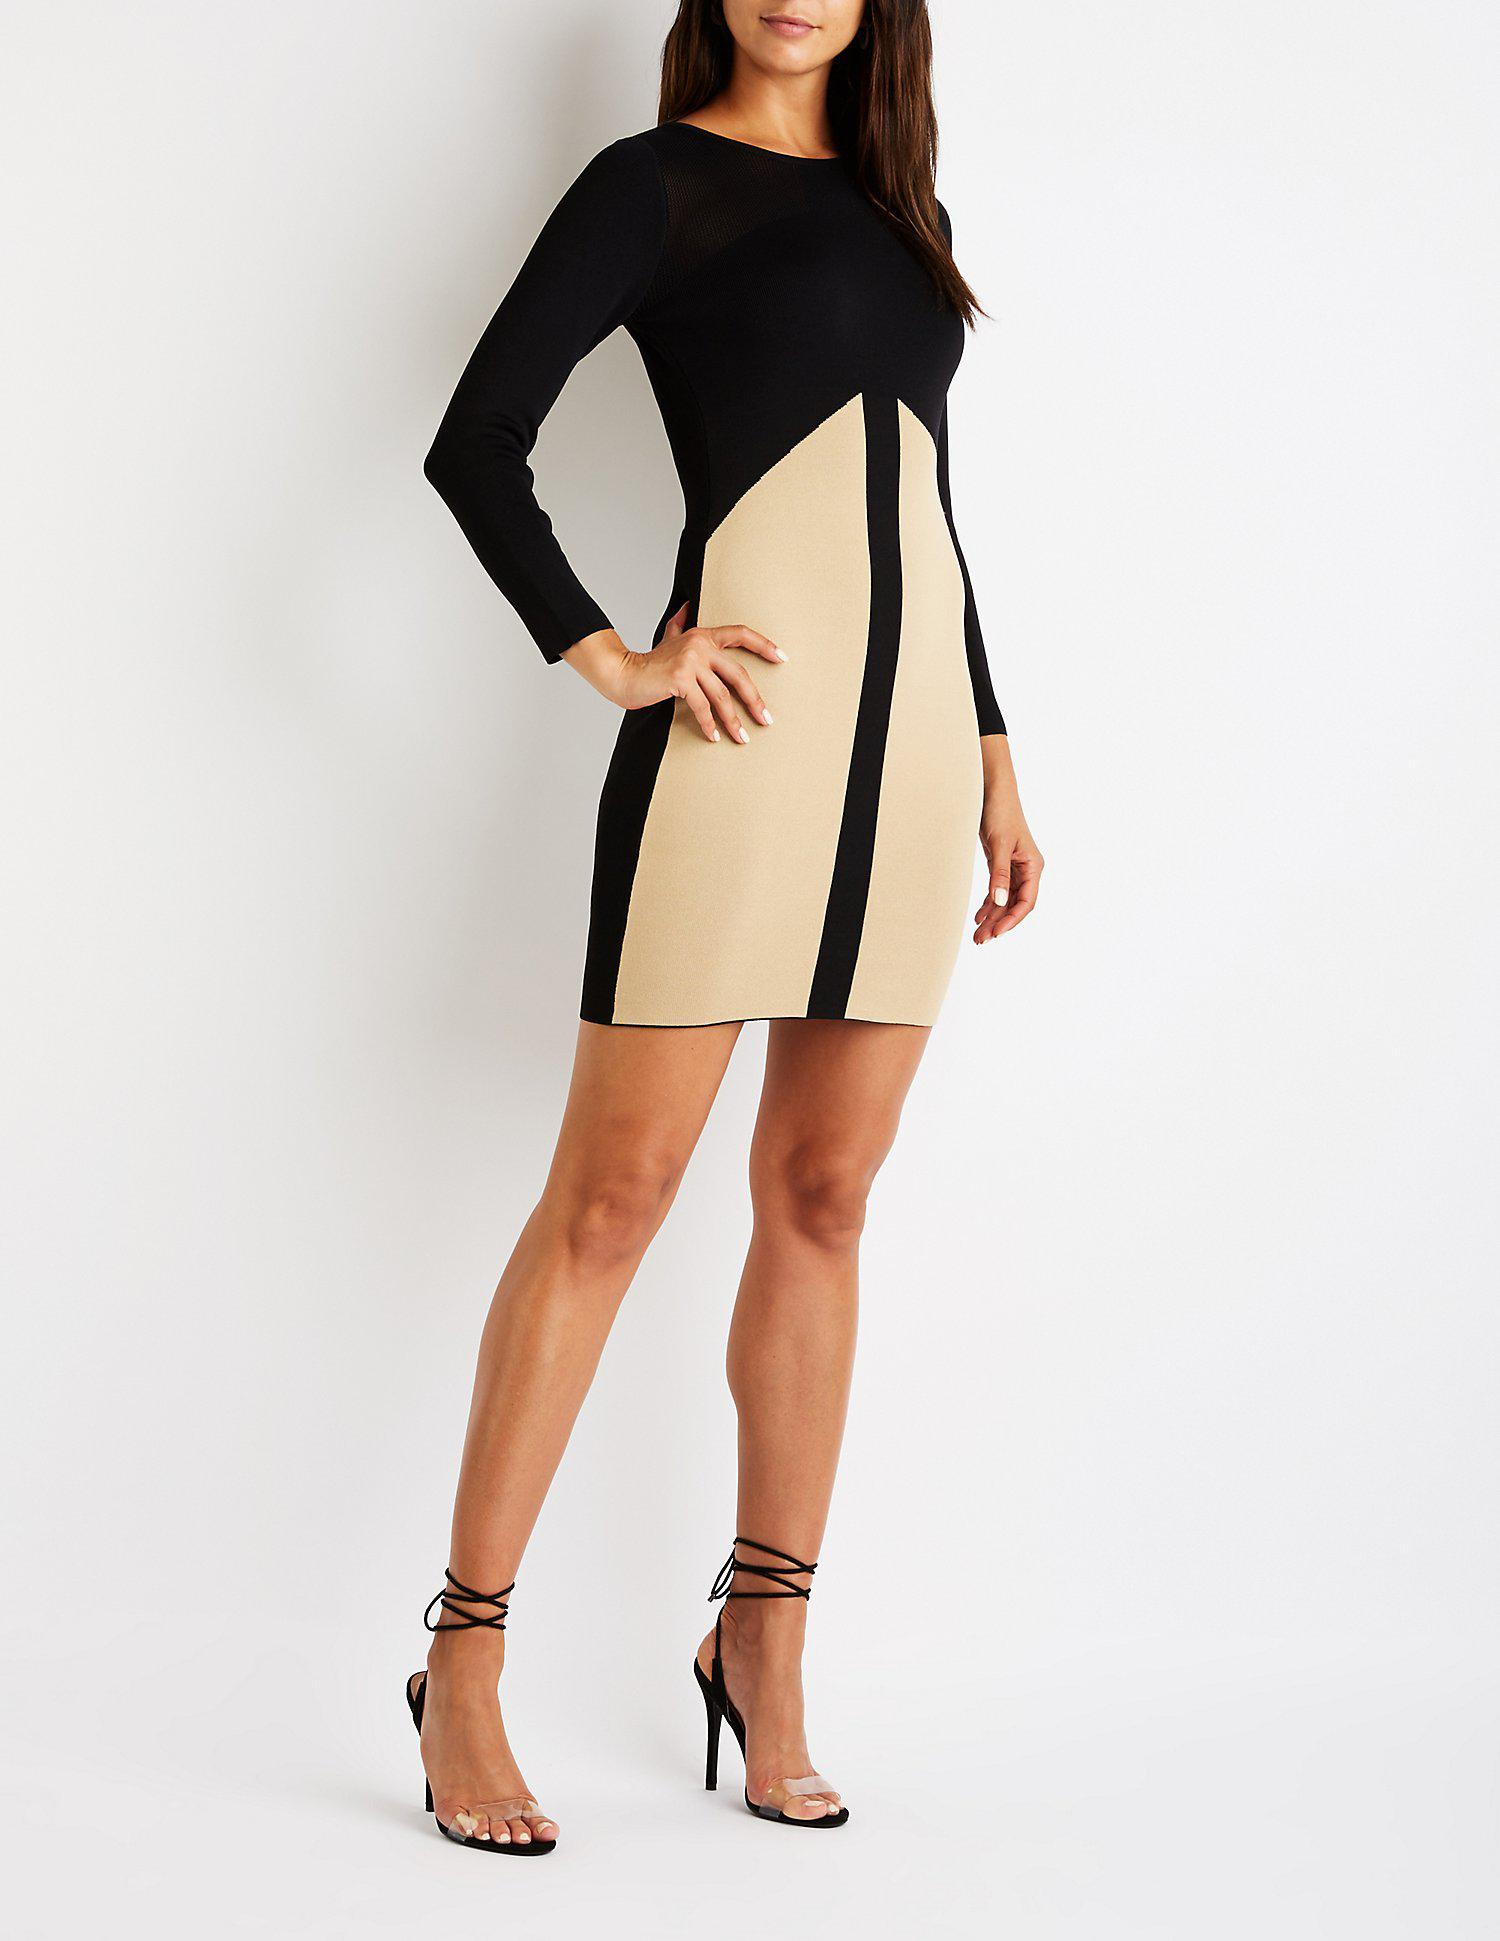 4813cb3b570 Lyst - Charlotte Russe Colorblock Midi Sweater Dress in Black